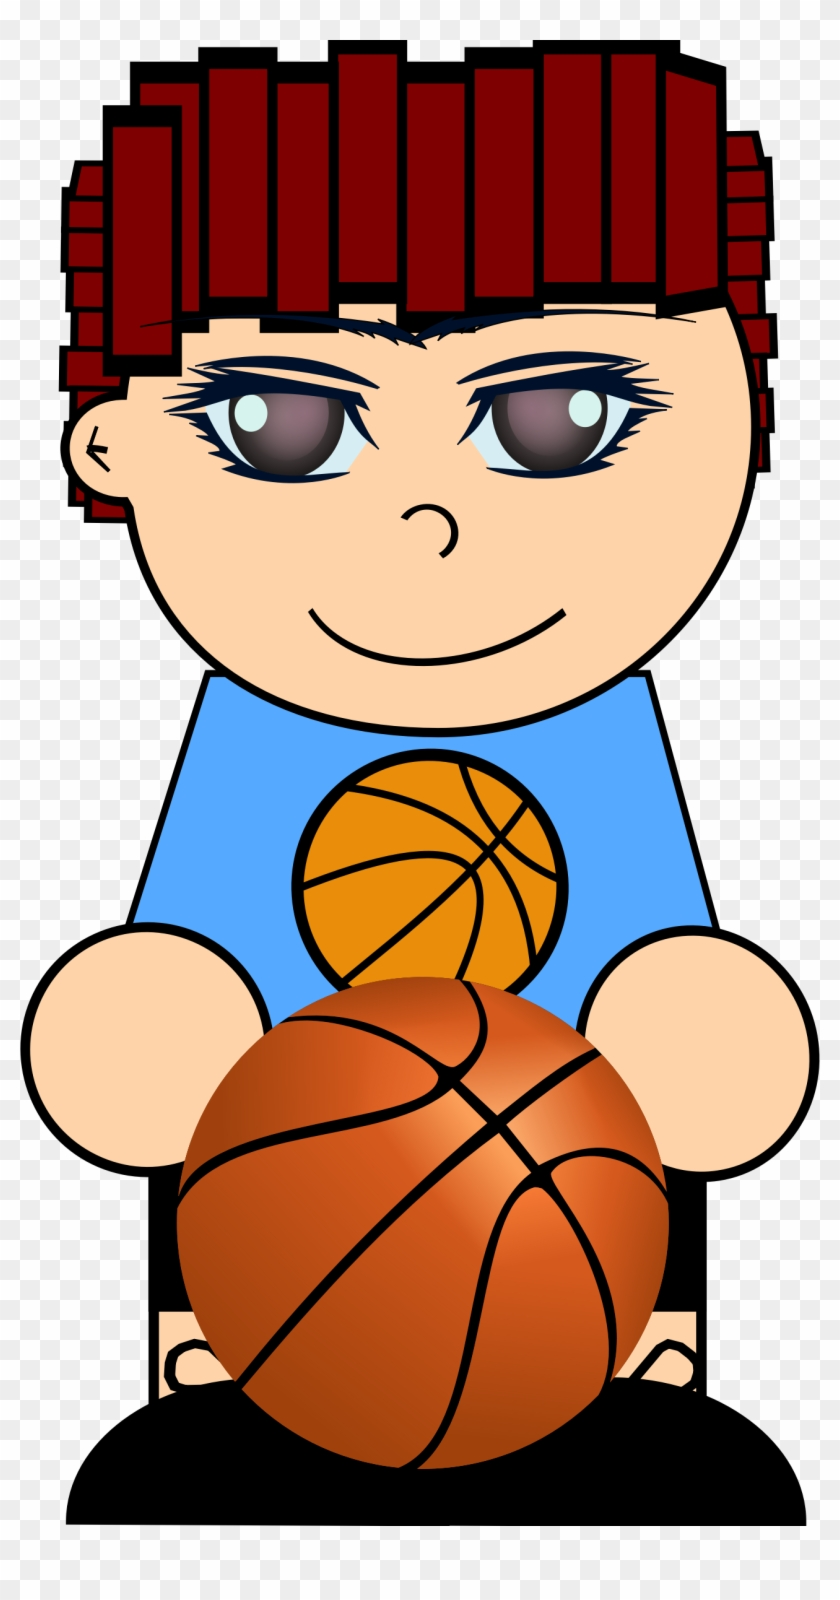 Boy With Basketball - Basketball Clip Art #288954